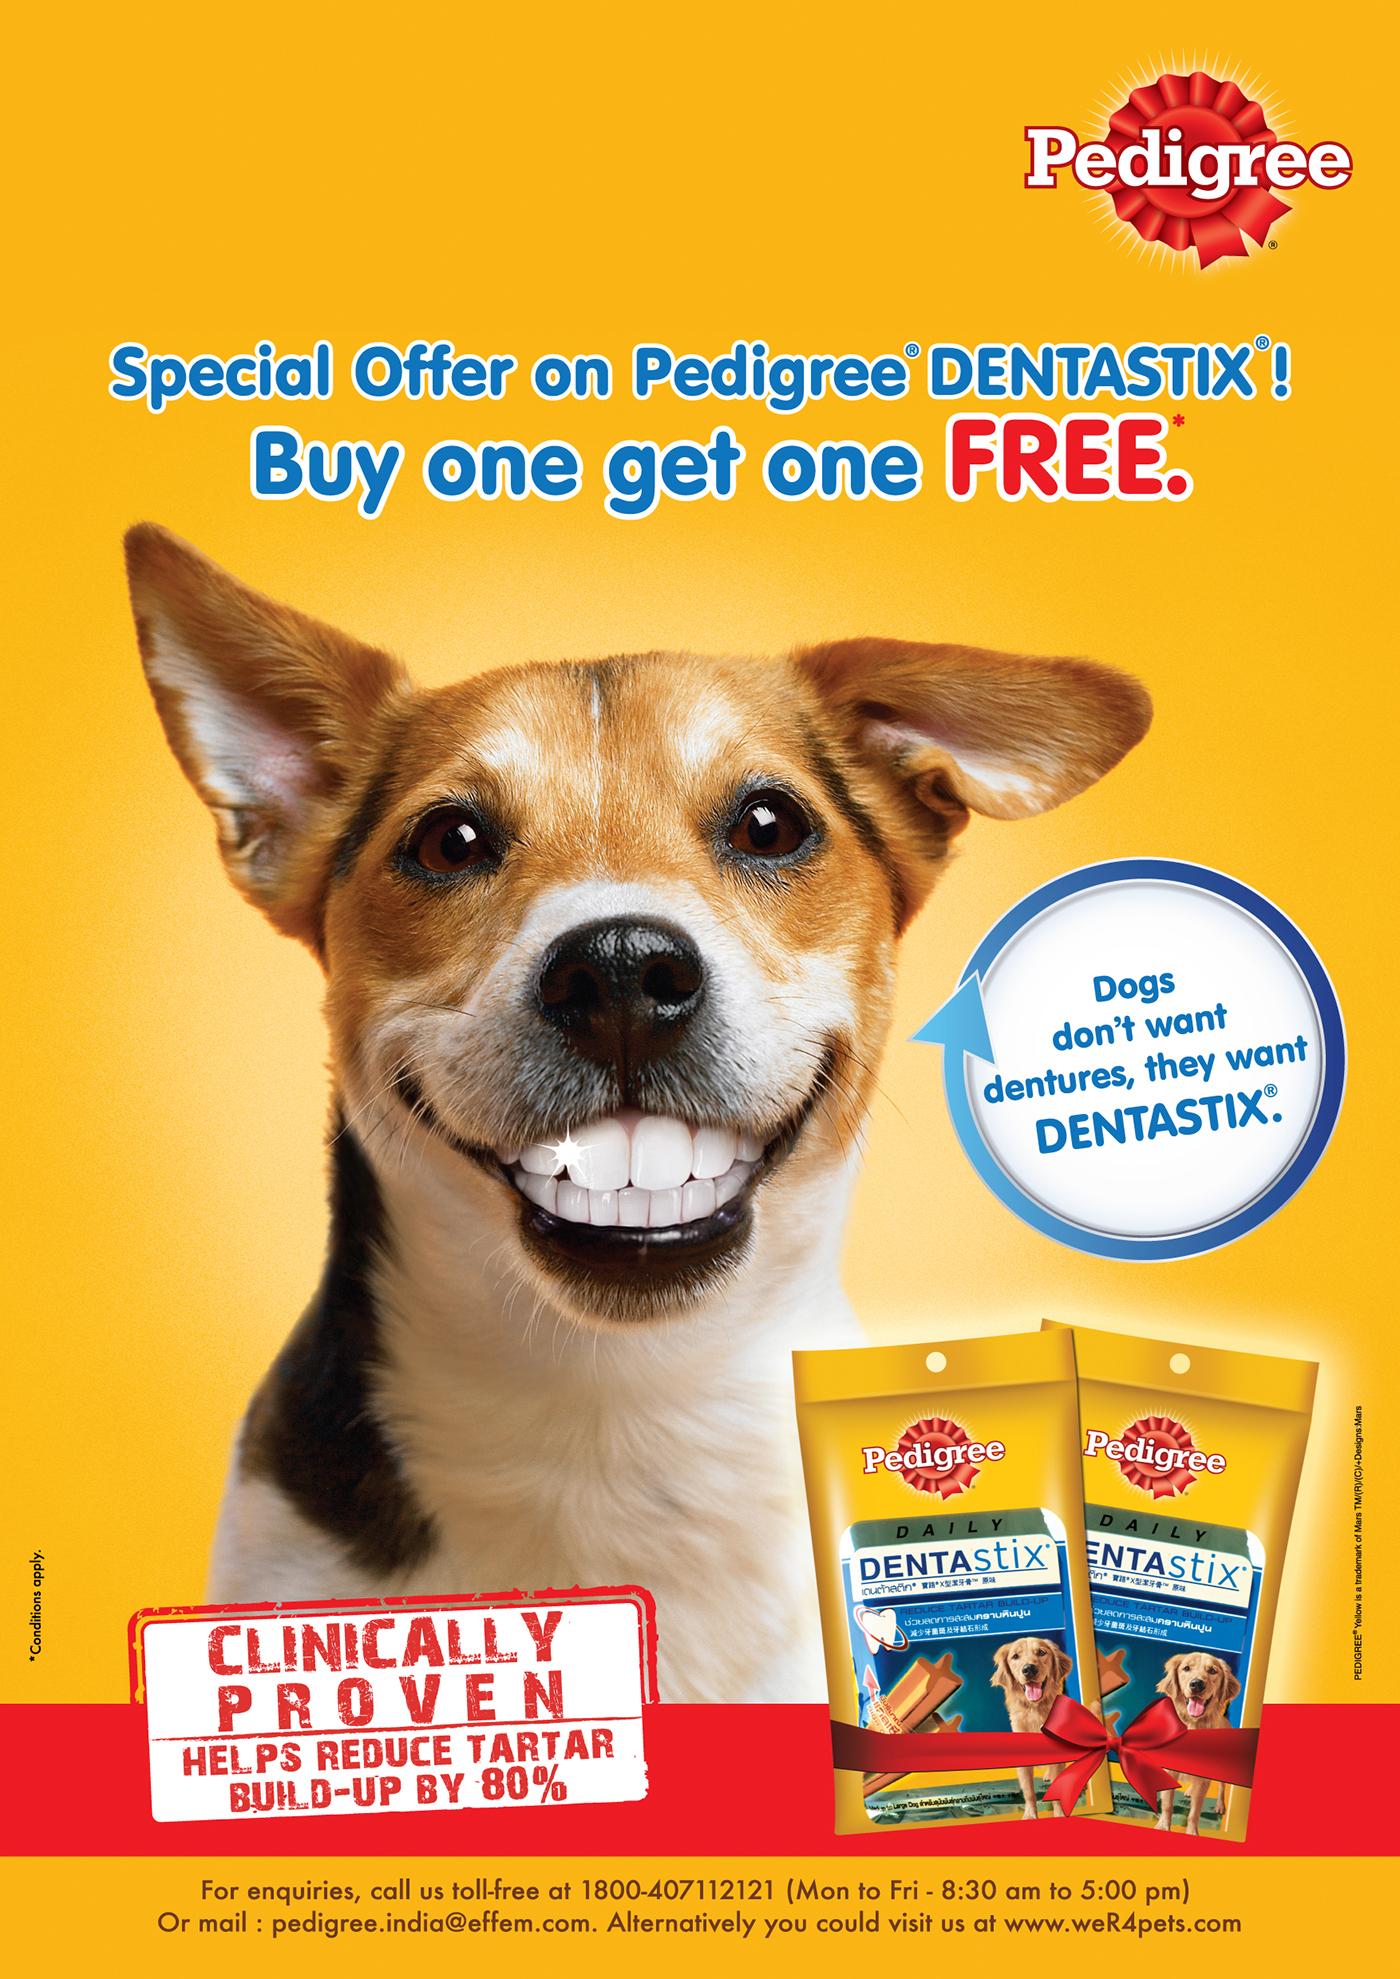 Pedigree Dentastix Summer Campaign Posters on Behance